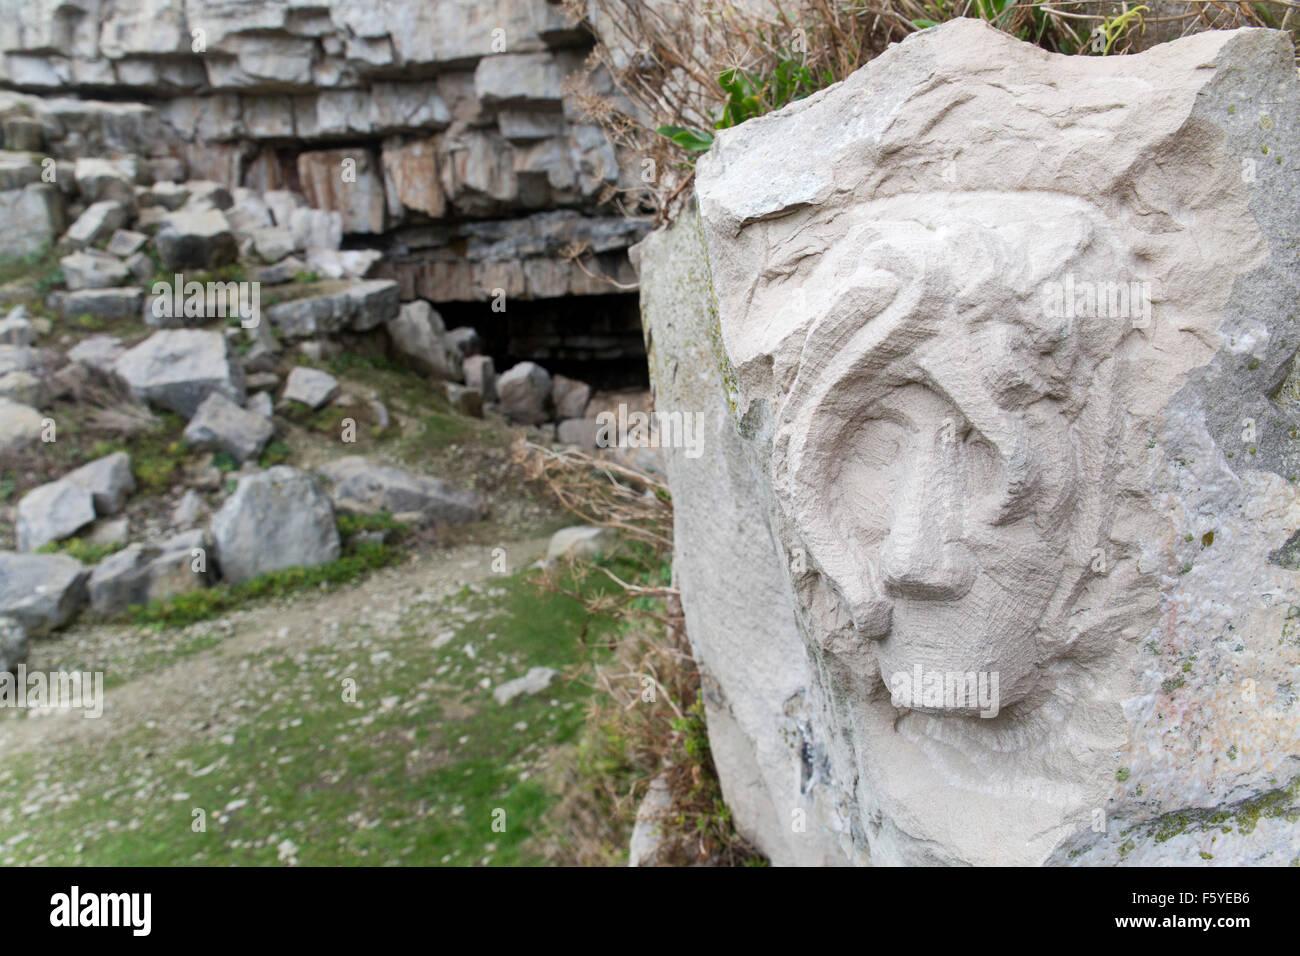 Carving of a Head; Winspit Quarry Worth Matravers; Dorset; UK - Stock Image